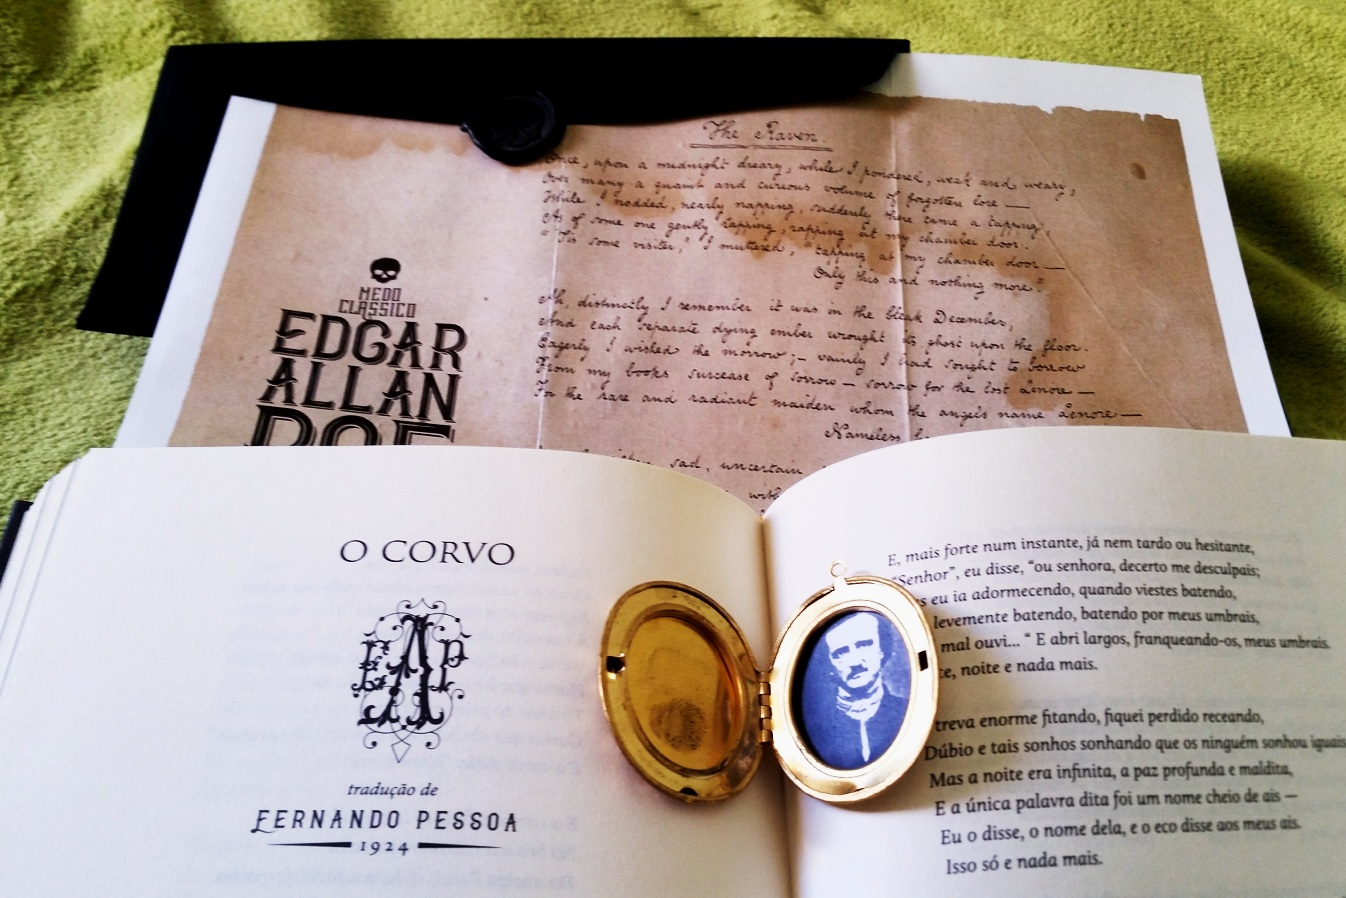 Edgar Allan Poe o corvo